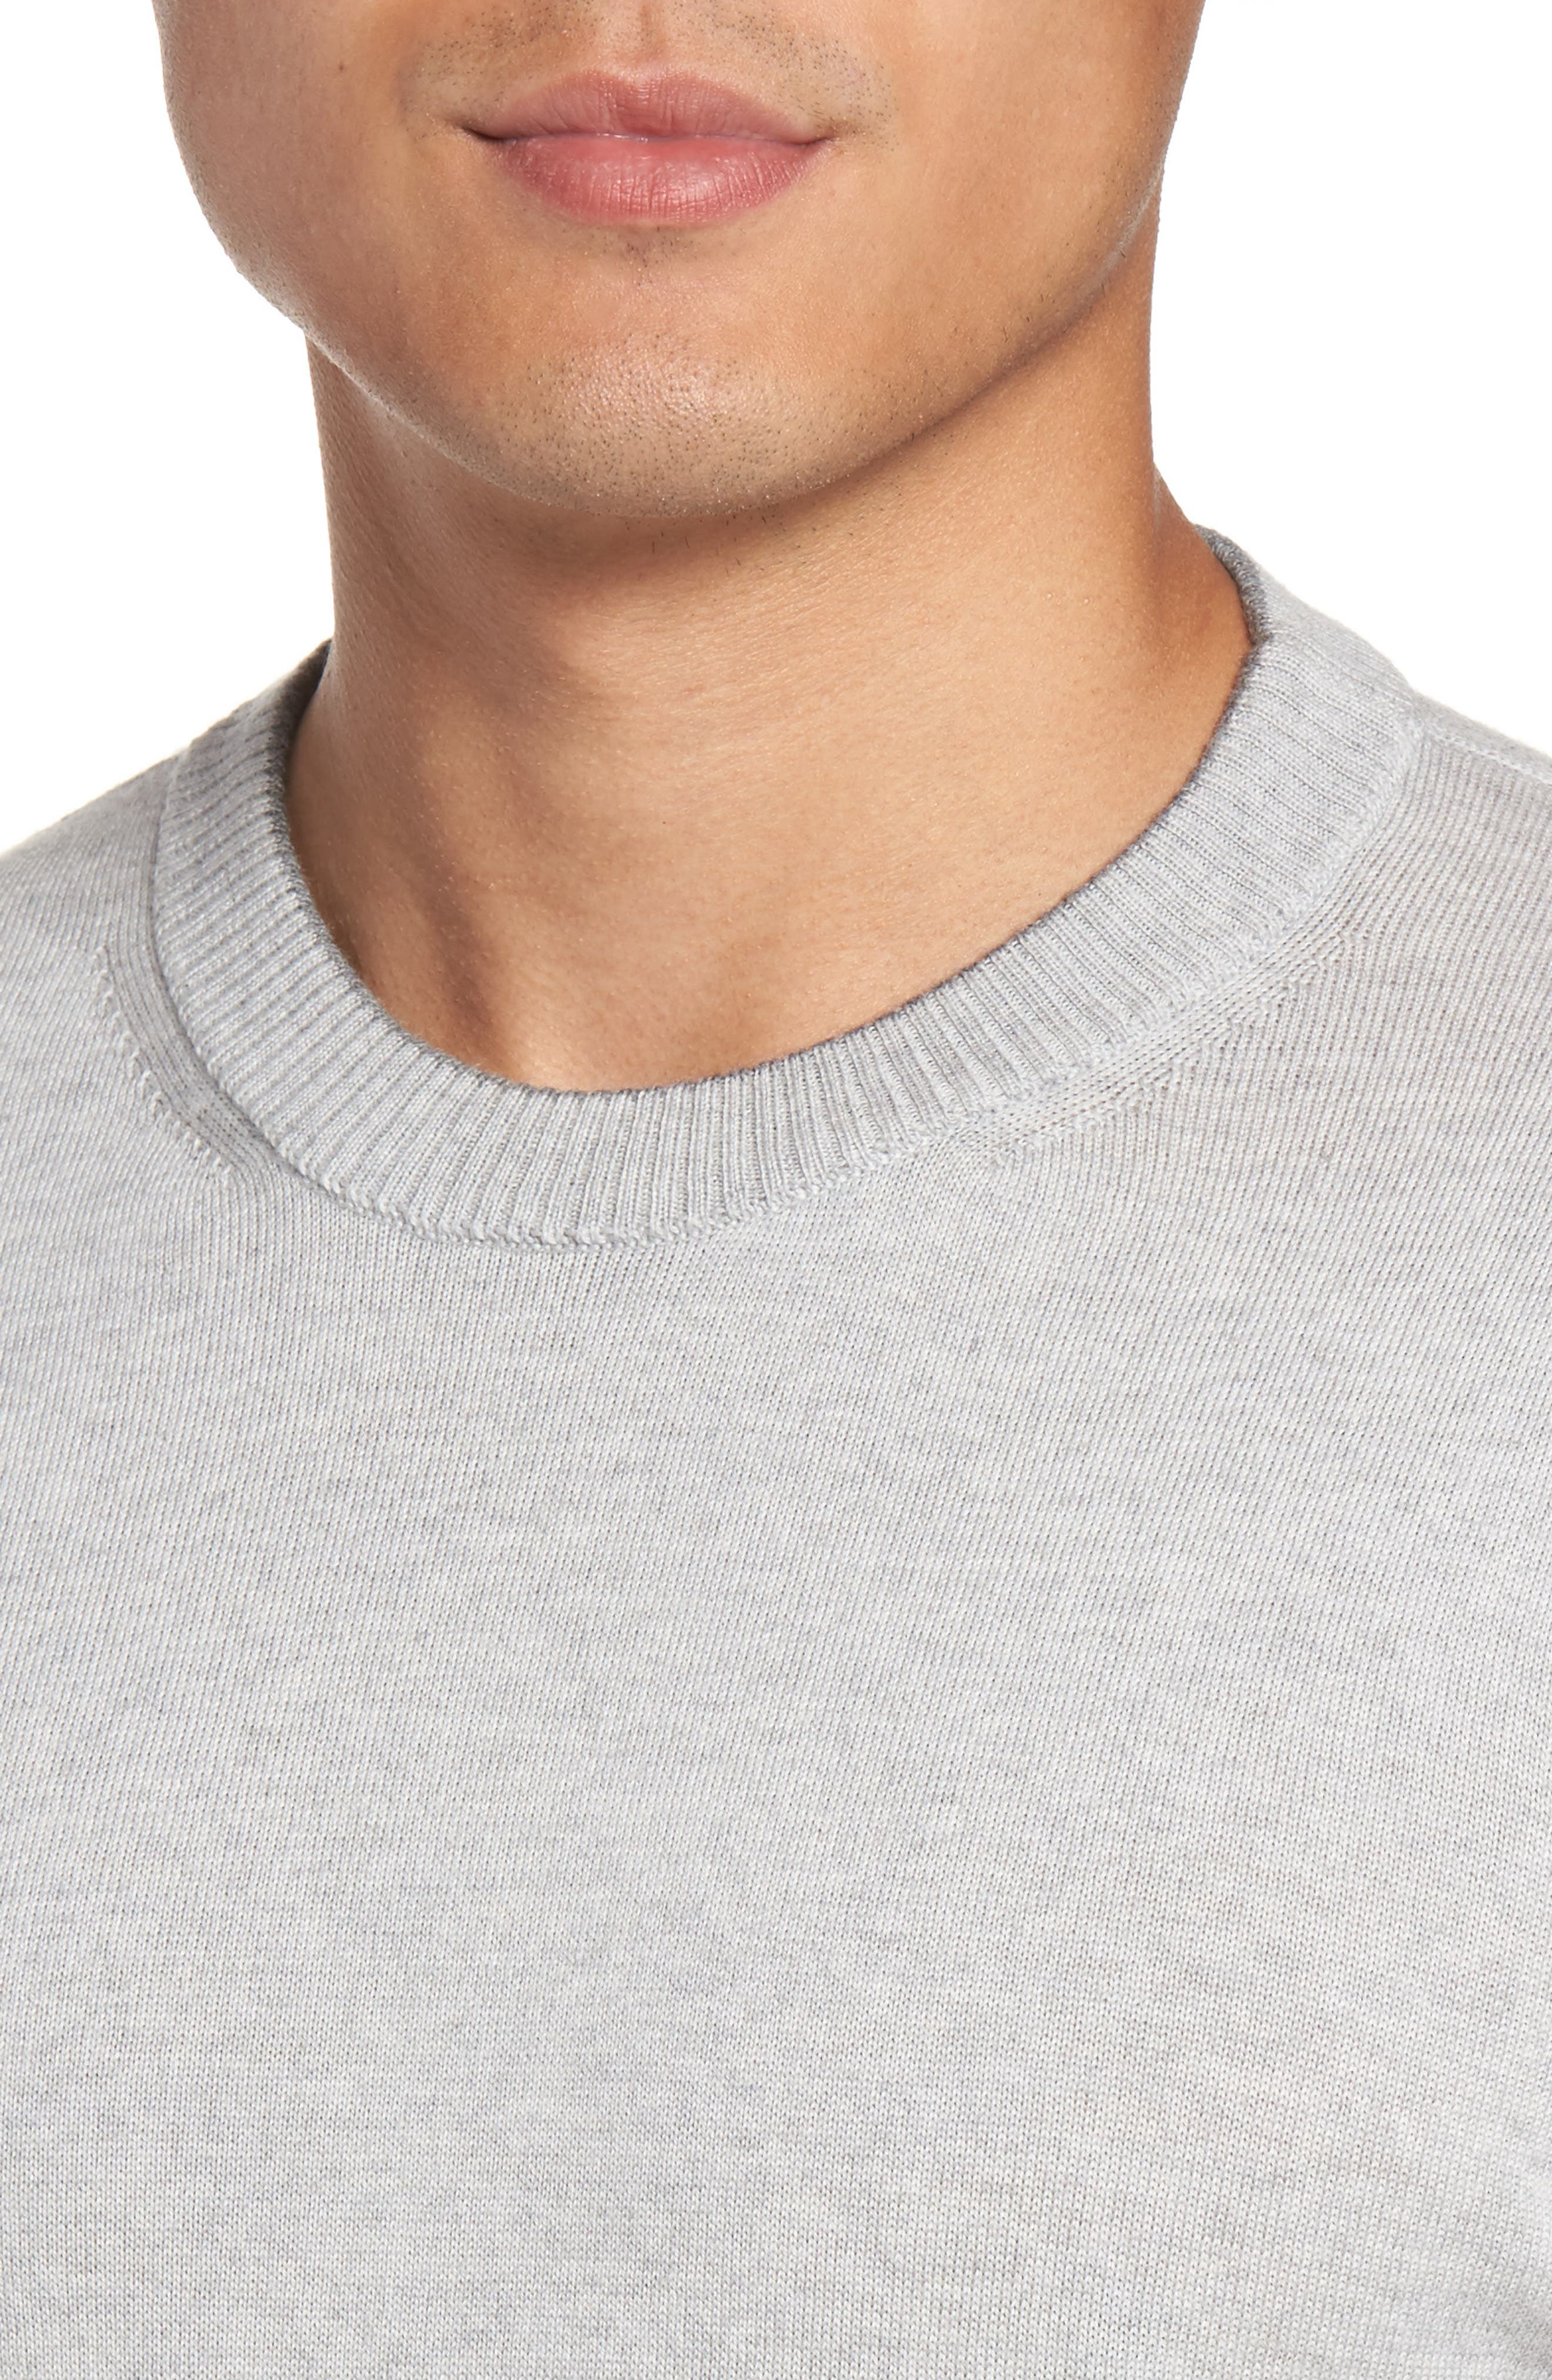 Virgin Wool Crewneck Sweater,                             Alternate thumbnail 4, color,                             Light Grey